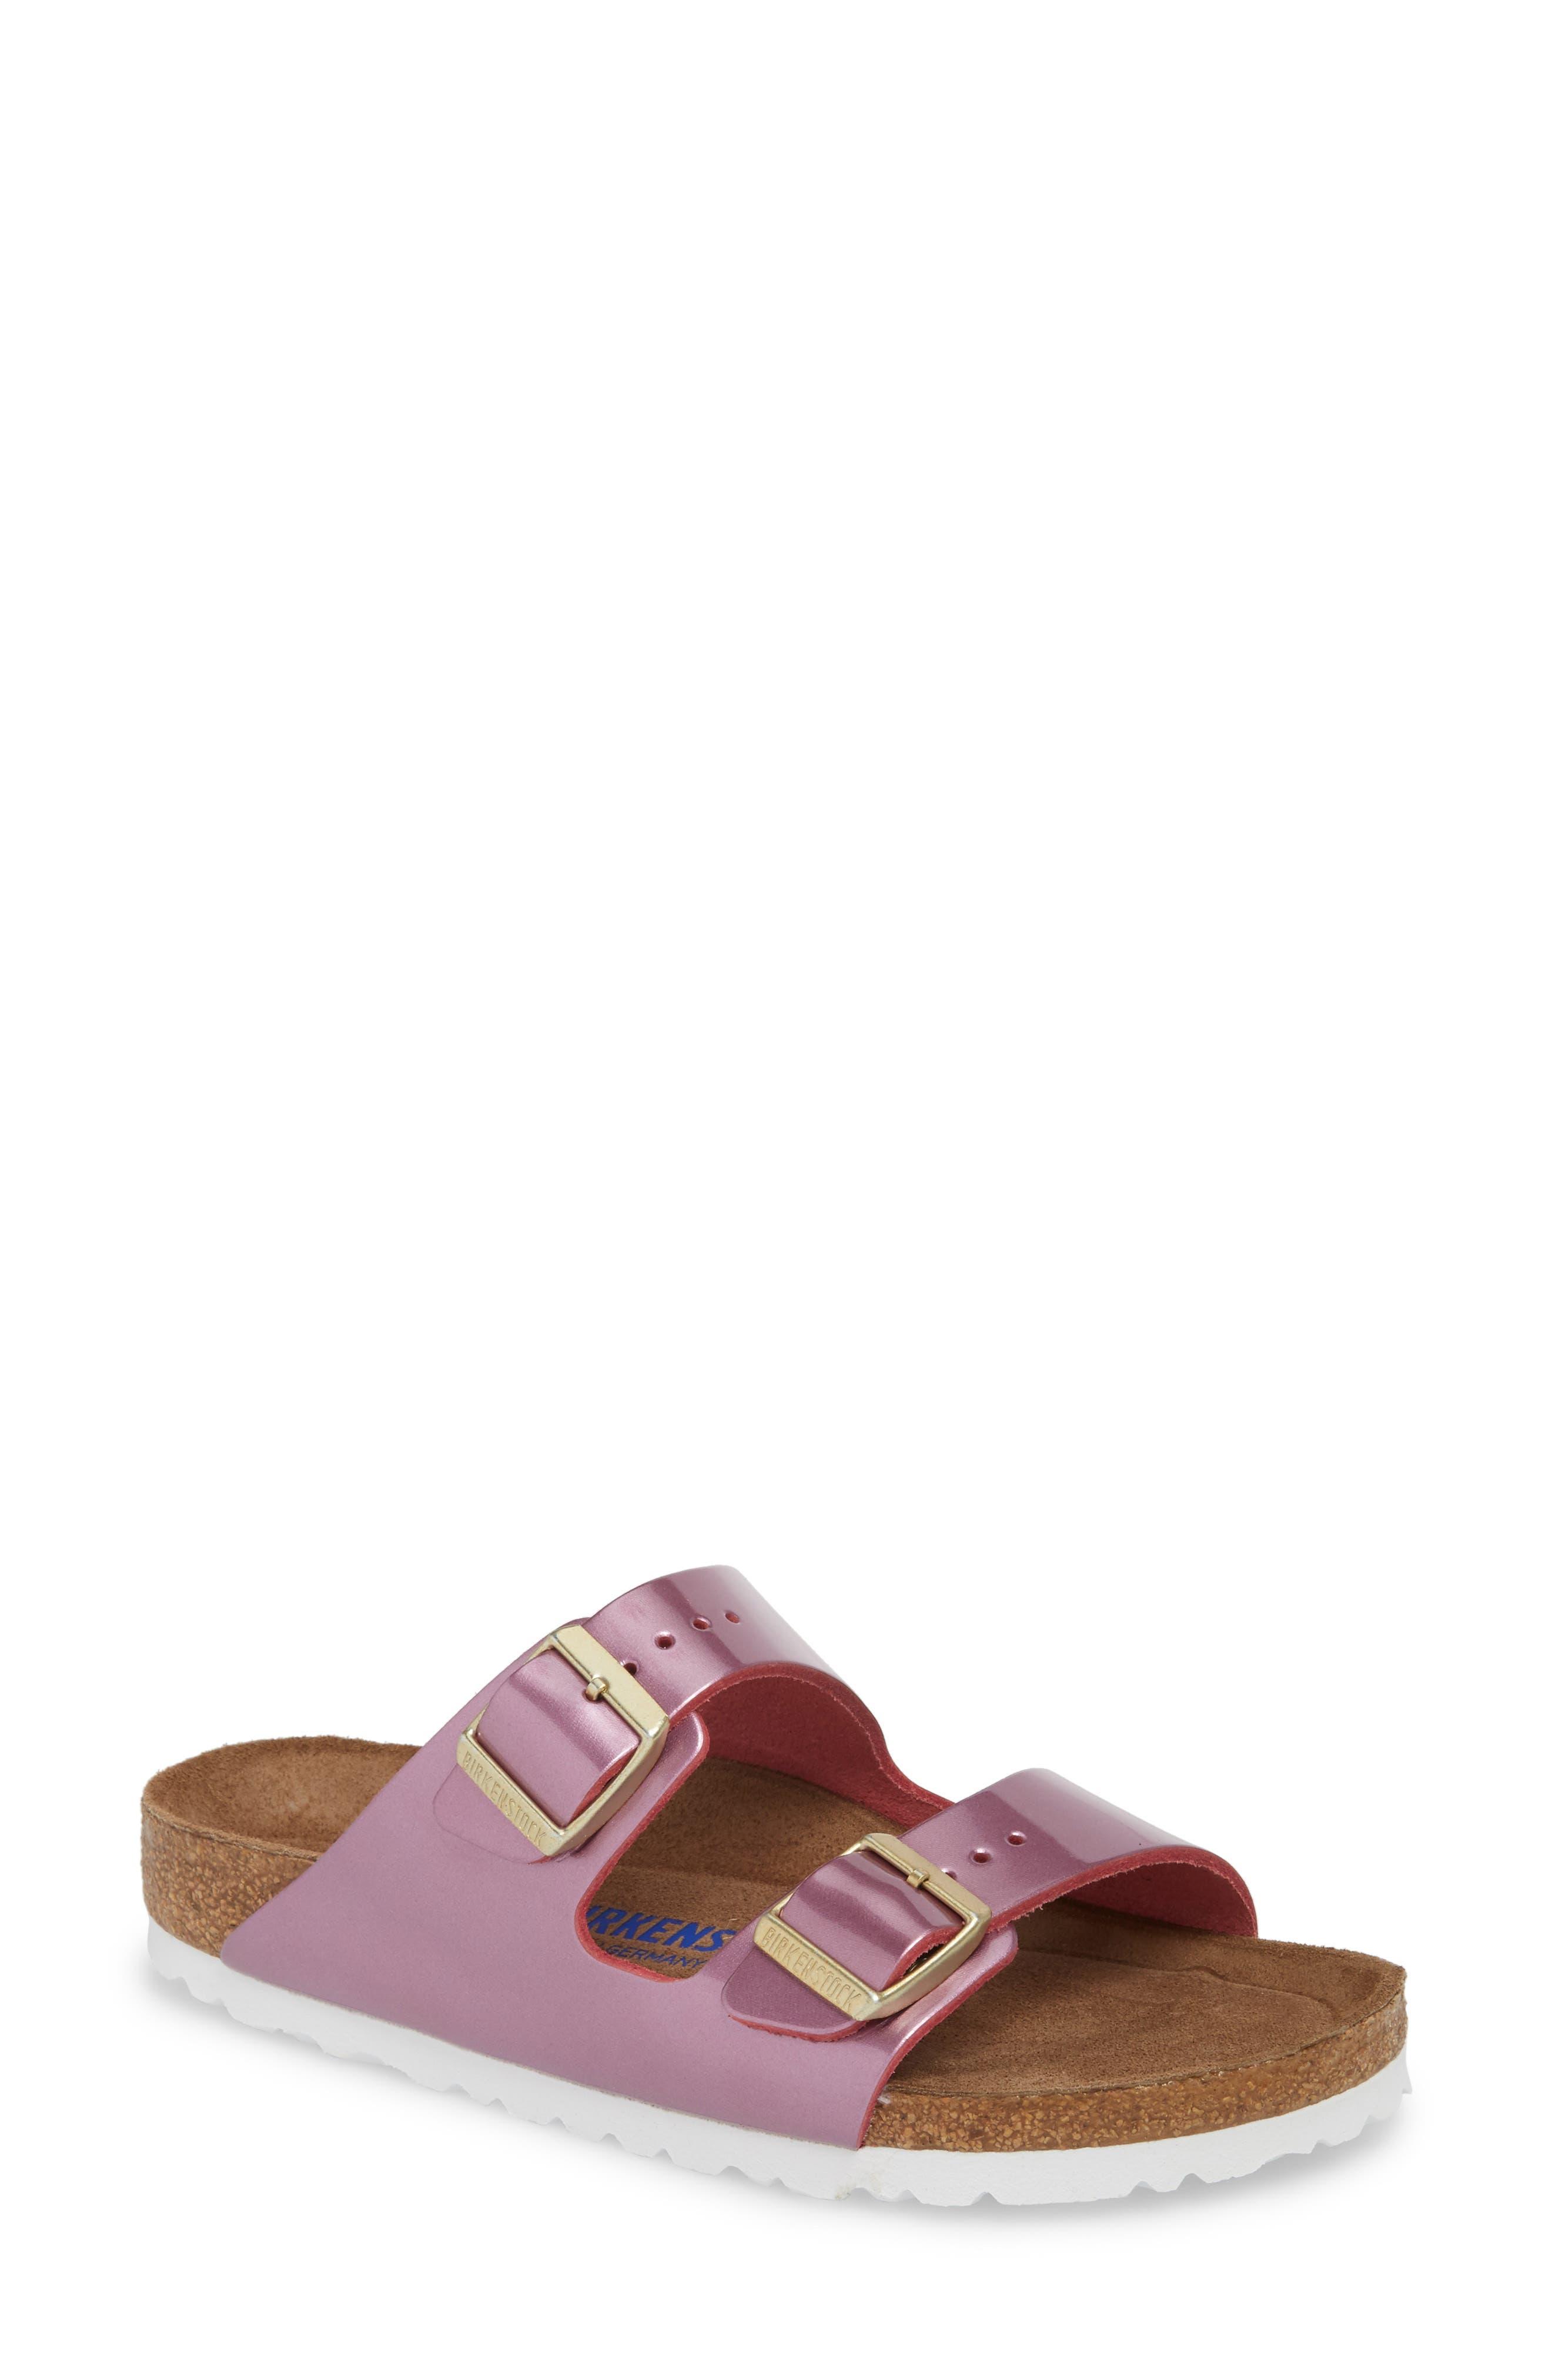 'Arizona' Soft Footbed Sandal,                         Main,                         color, Spectacular Rose Leather